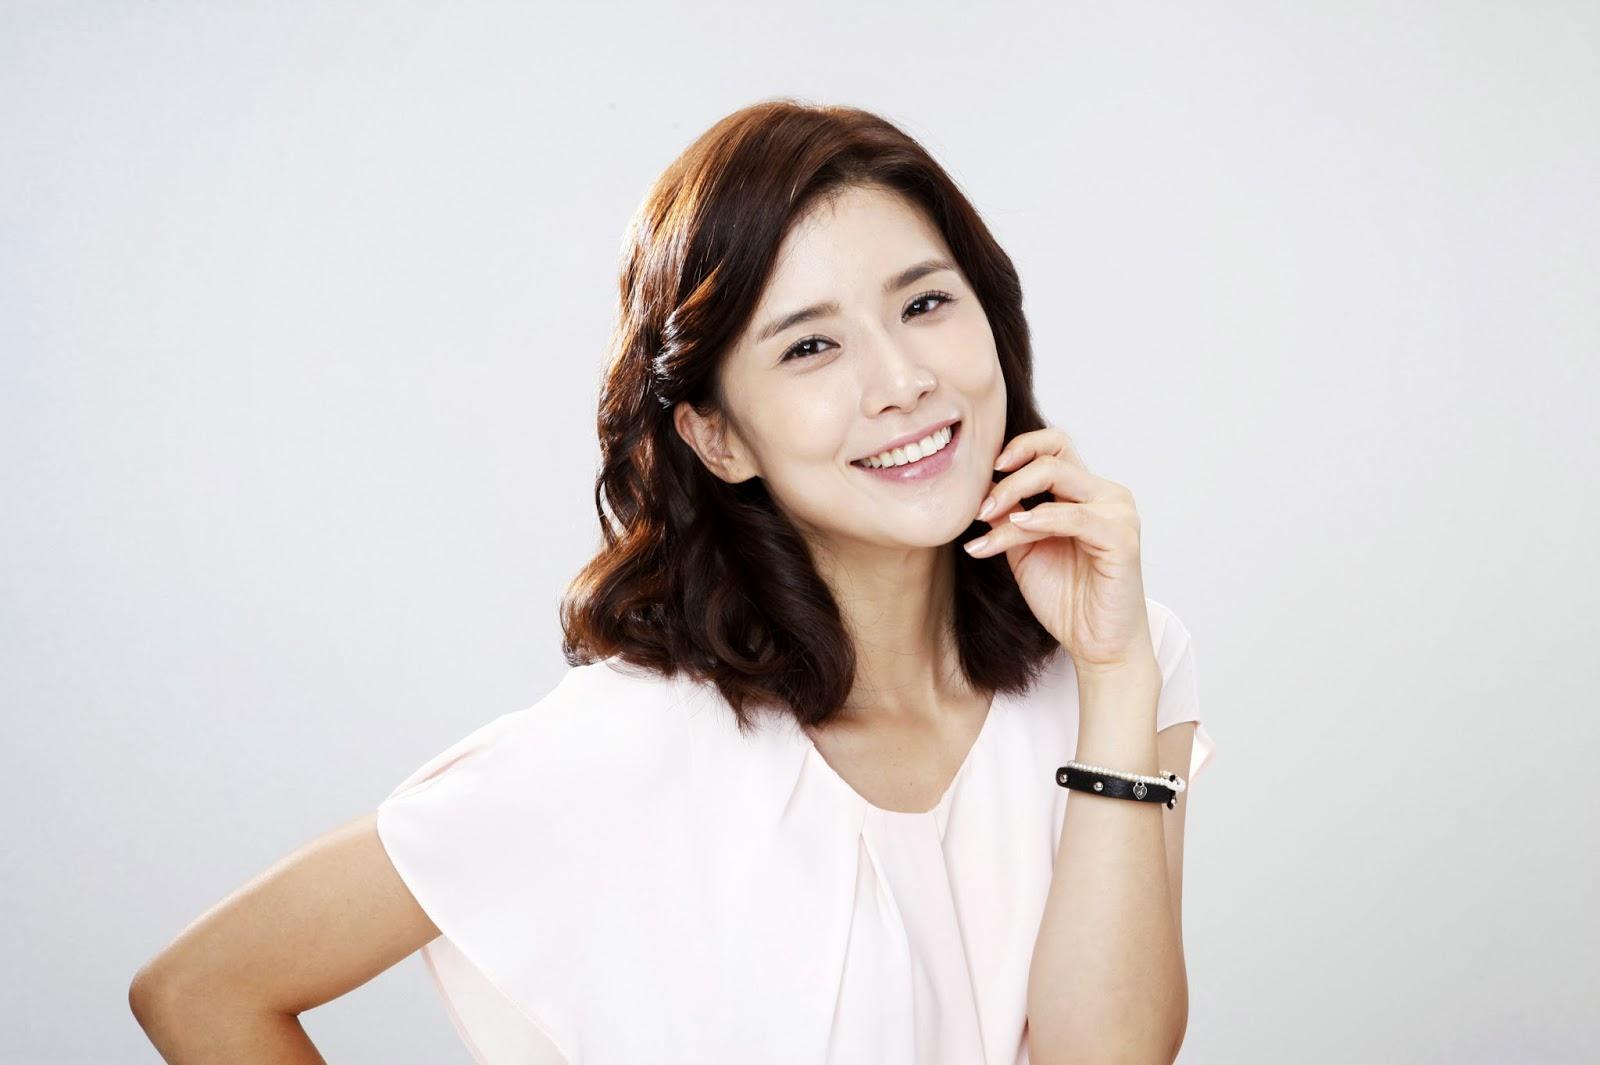 Lee Bo Young To Break 3-Year Hiatus With New Drama